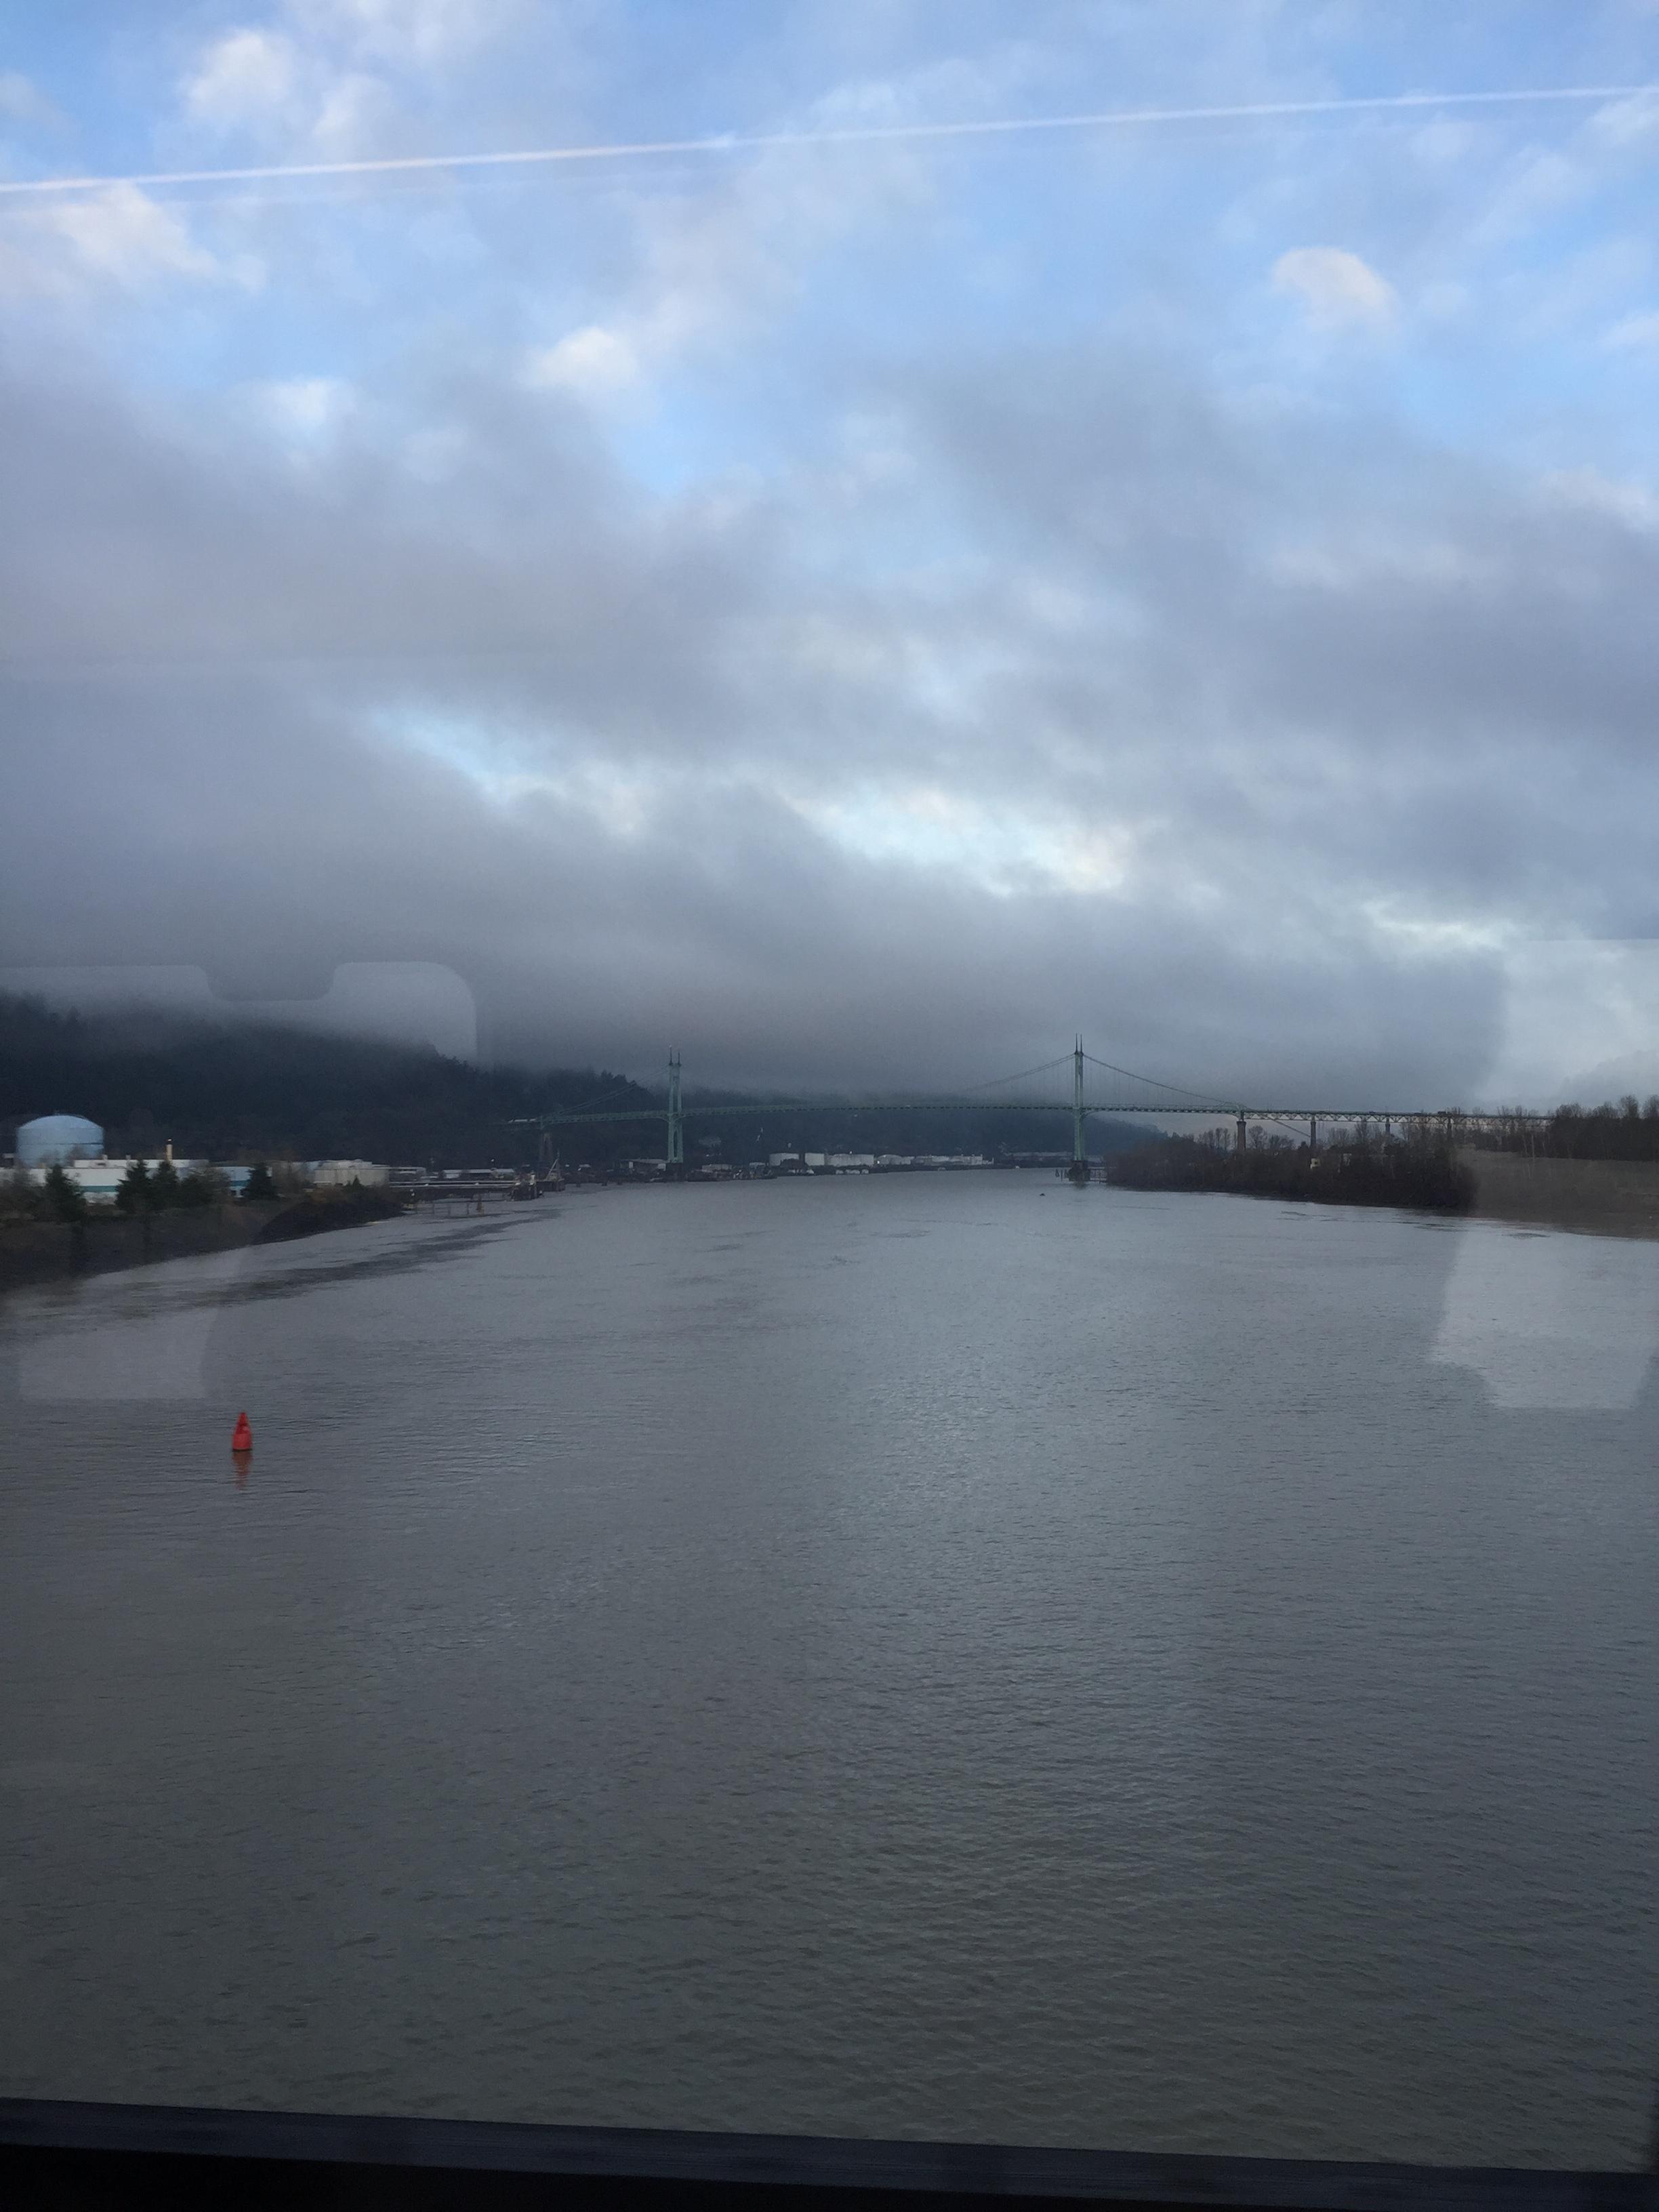 Crossing the train bridge over the Willamette River. The St. John's Bridge in the background.